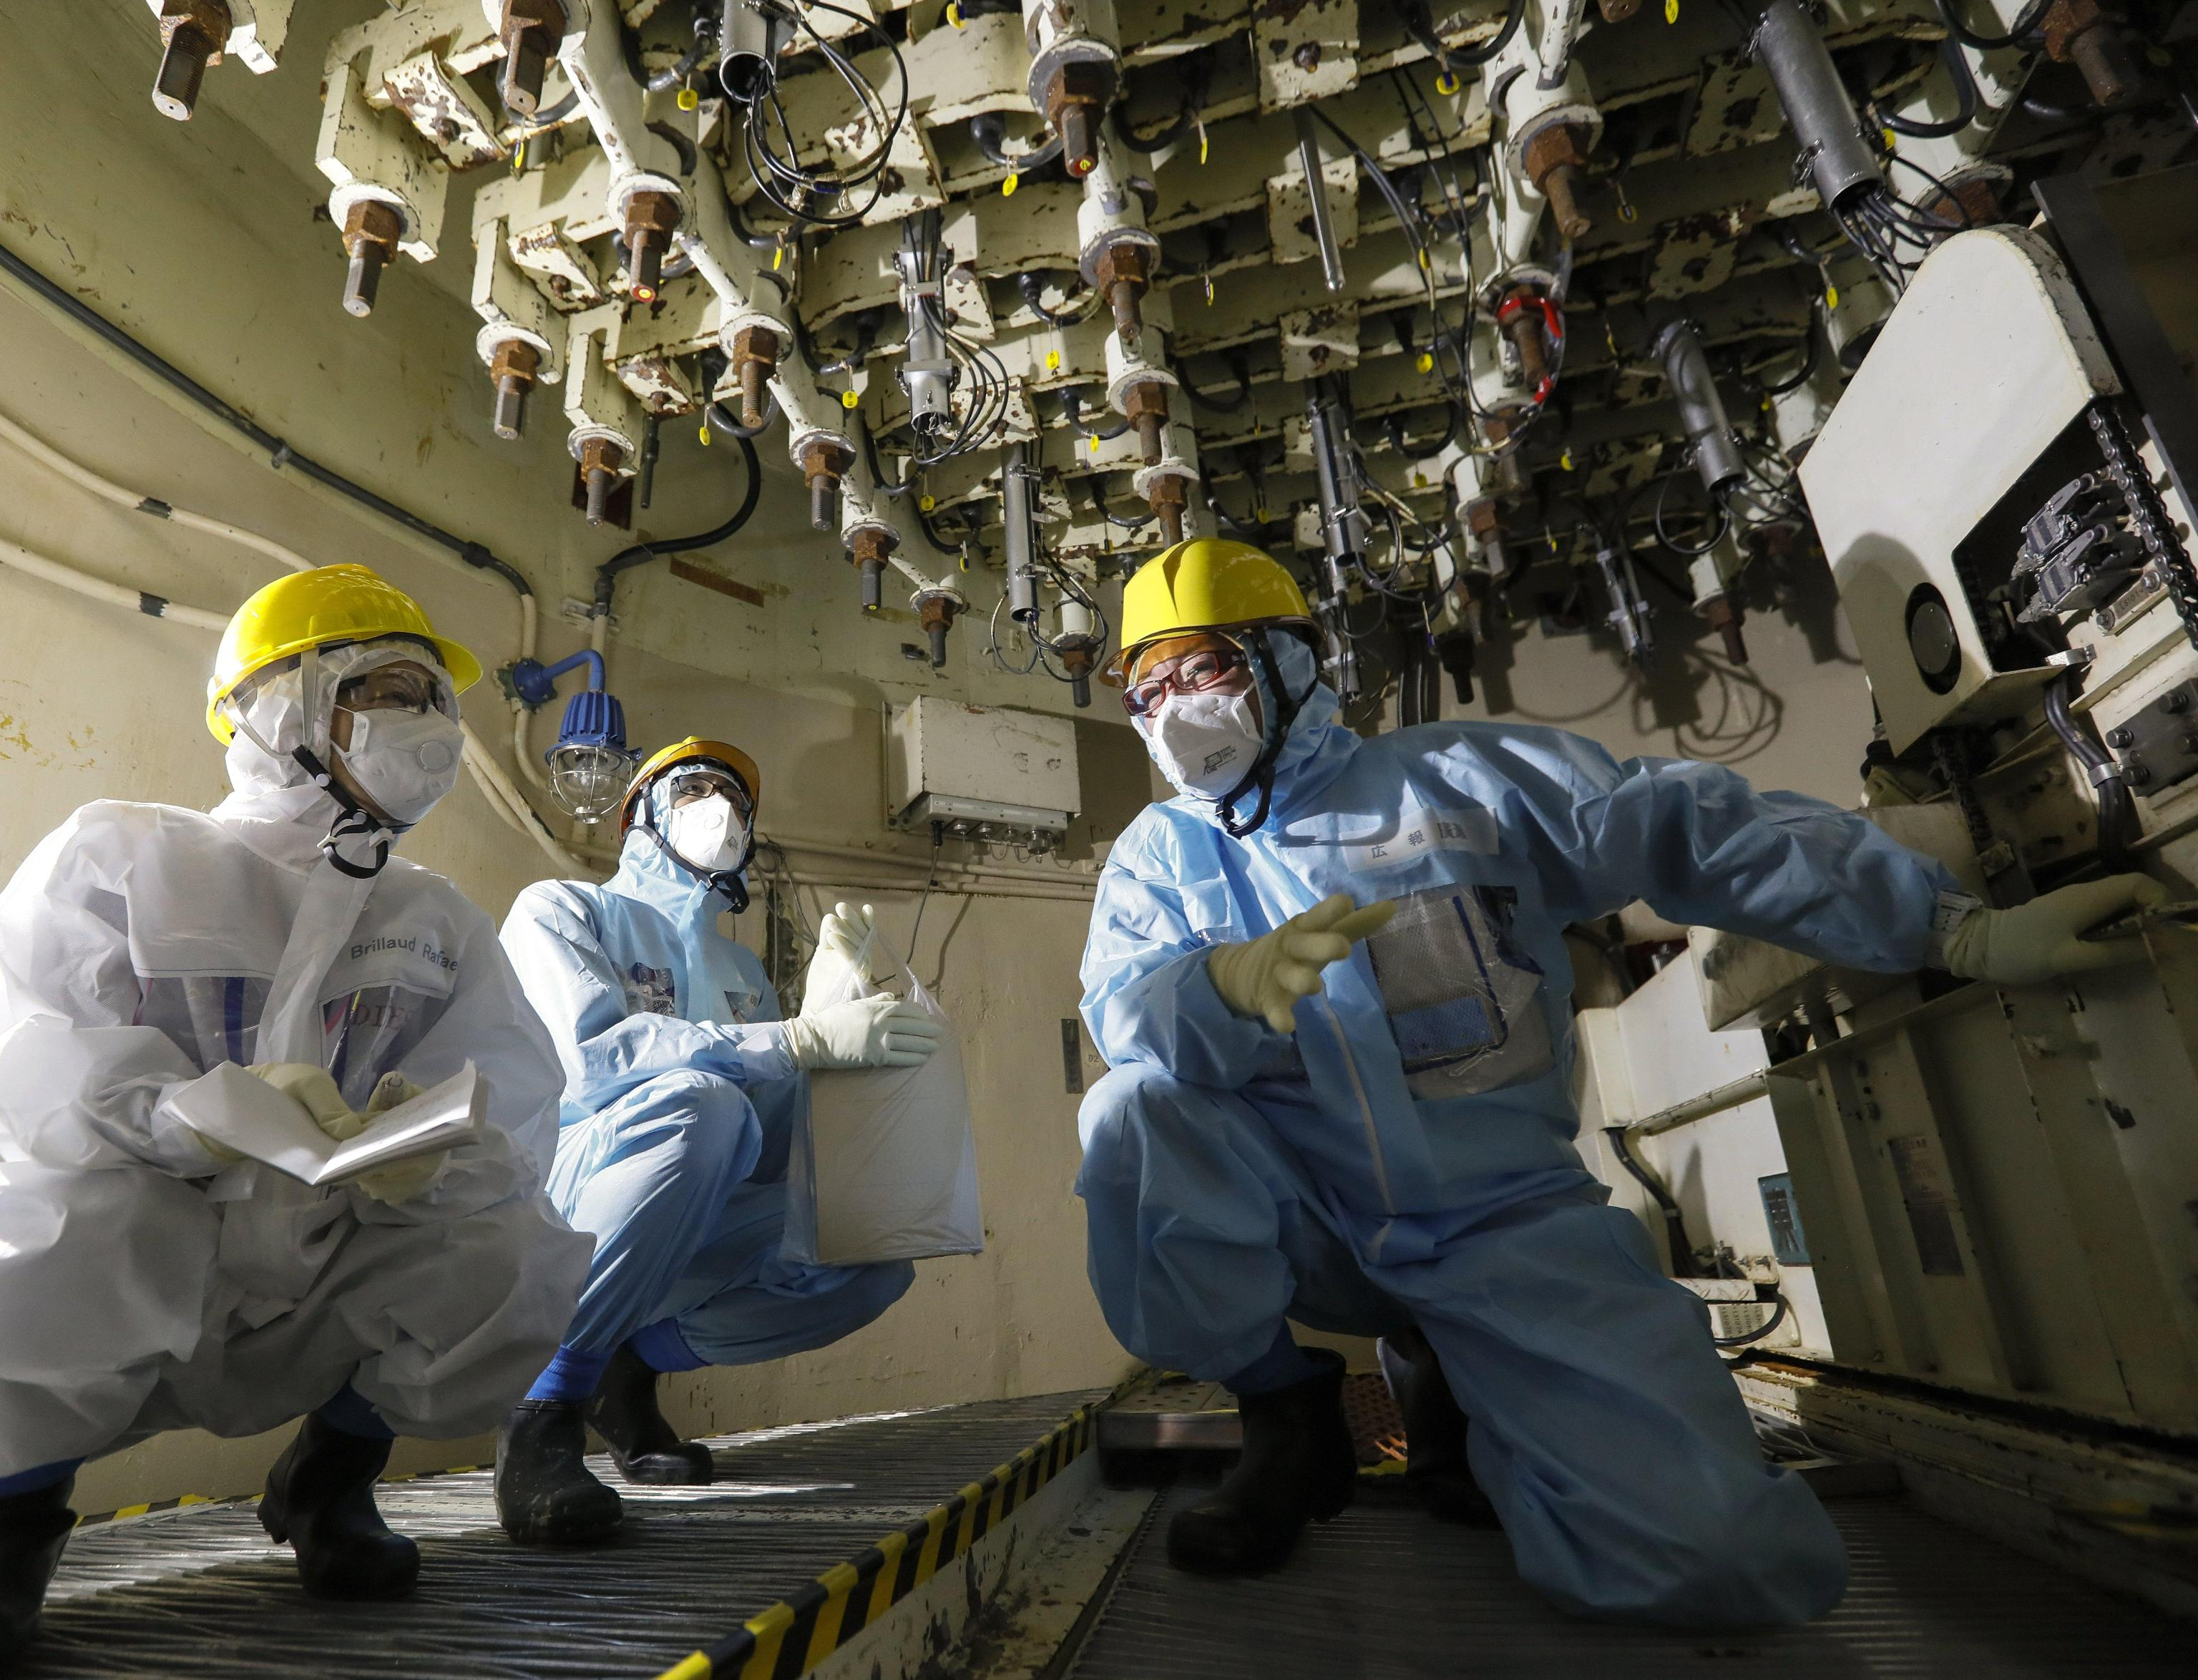 Giappone: indennizzo a operaio Fukushima